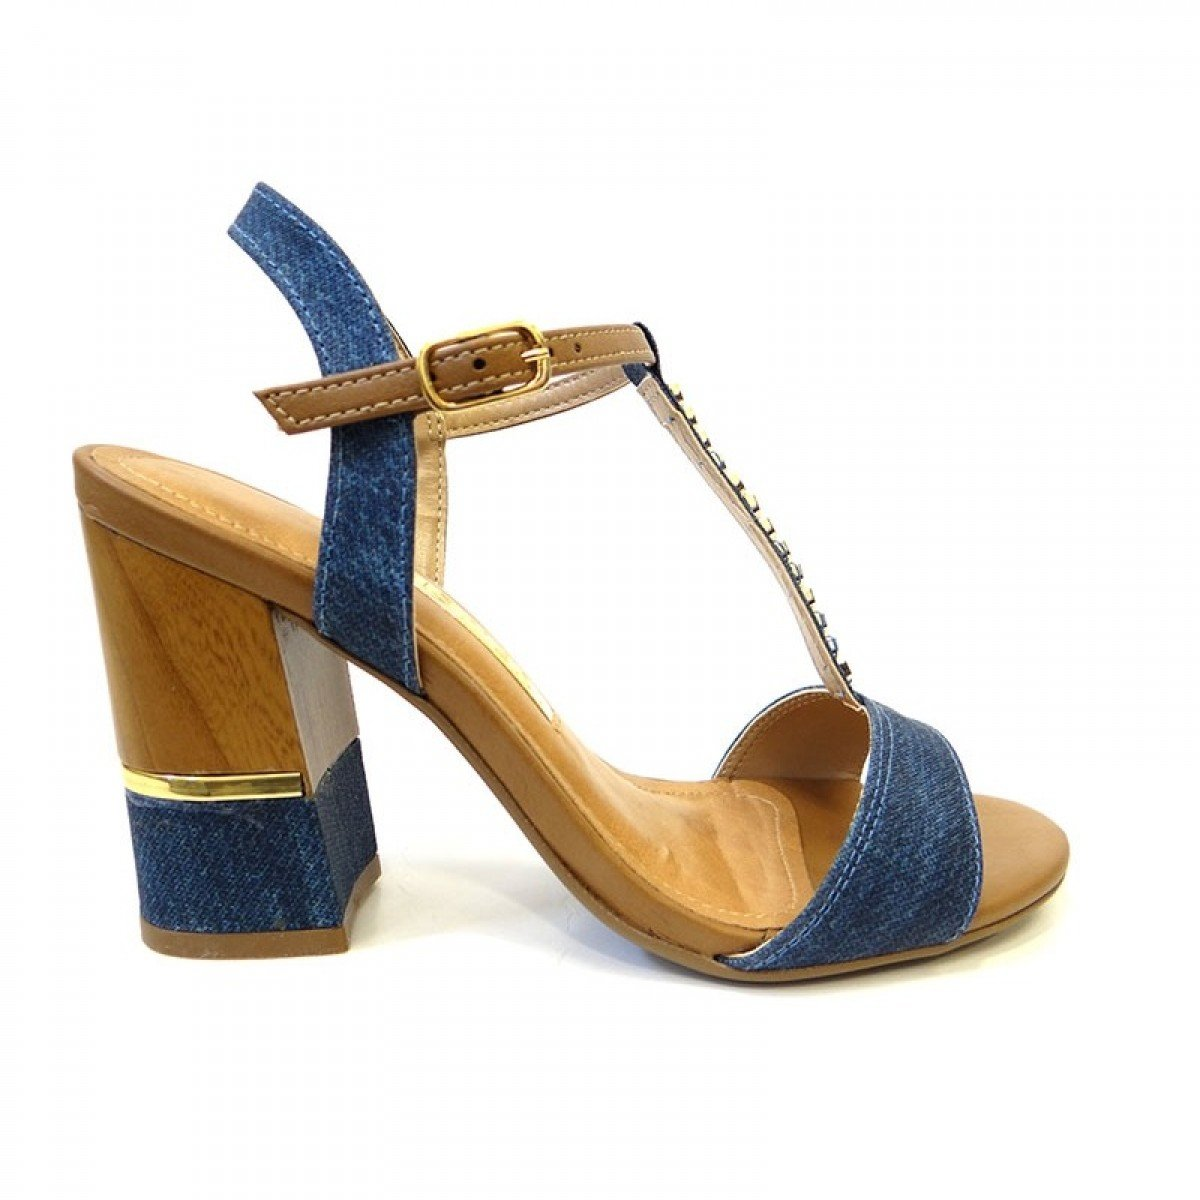 dd07a4b1f Sandália Feminina Via Marte Salto Grosso Jeans Napa - Compre Agora ...